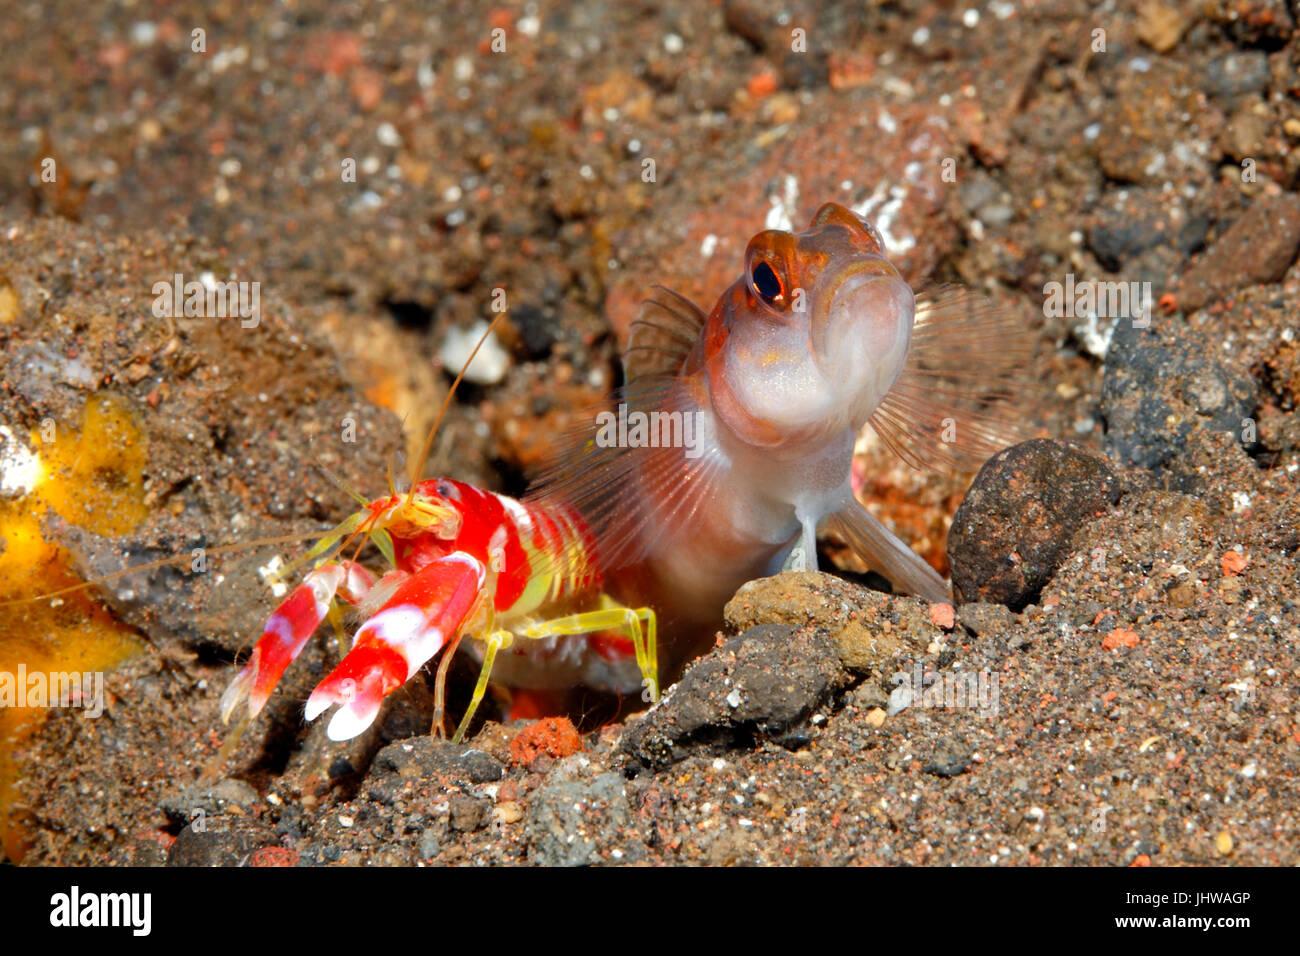 flagtail-shrimpgoby-amblyeleotris-yanoi-with-alpheid-shrimp-alpheus-JHWAGP.jpg